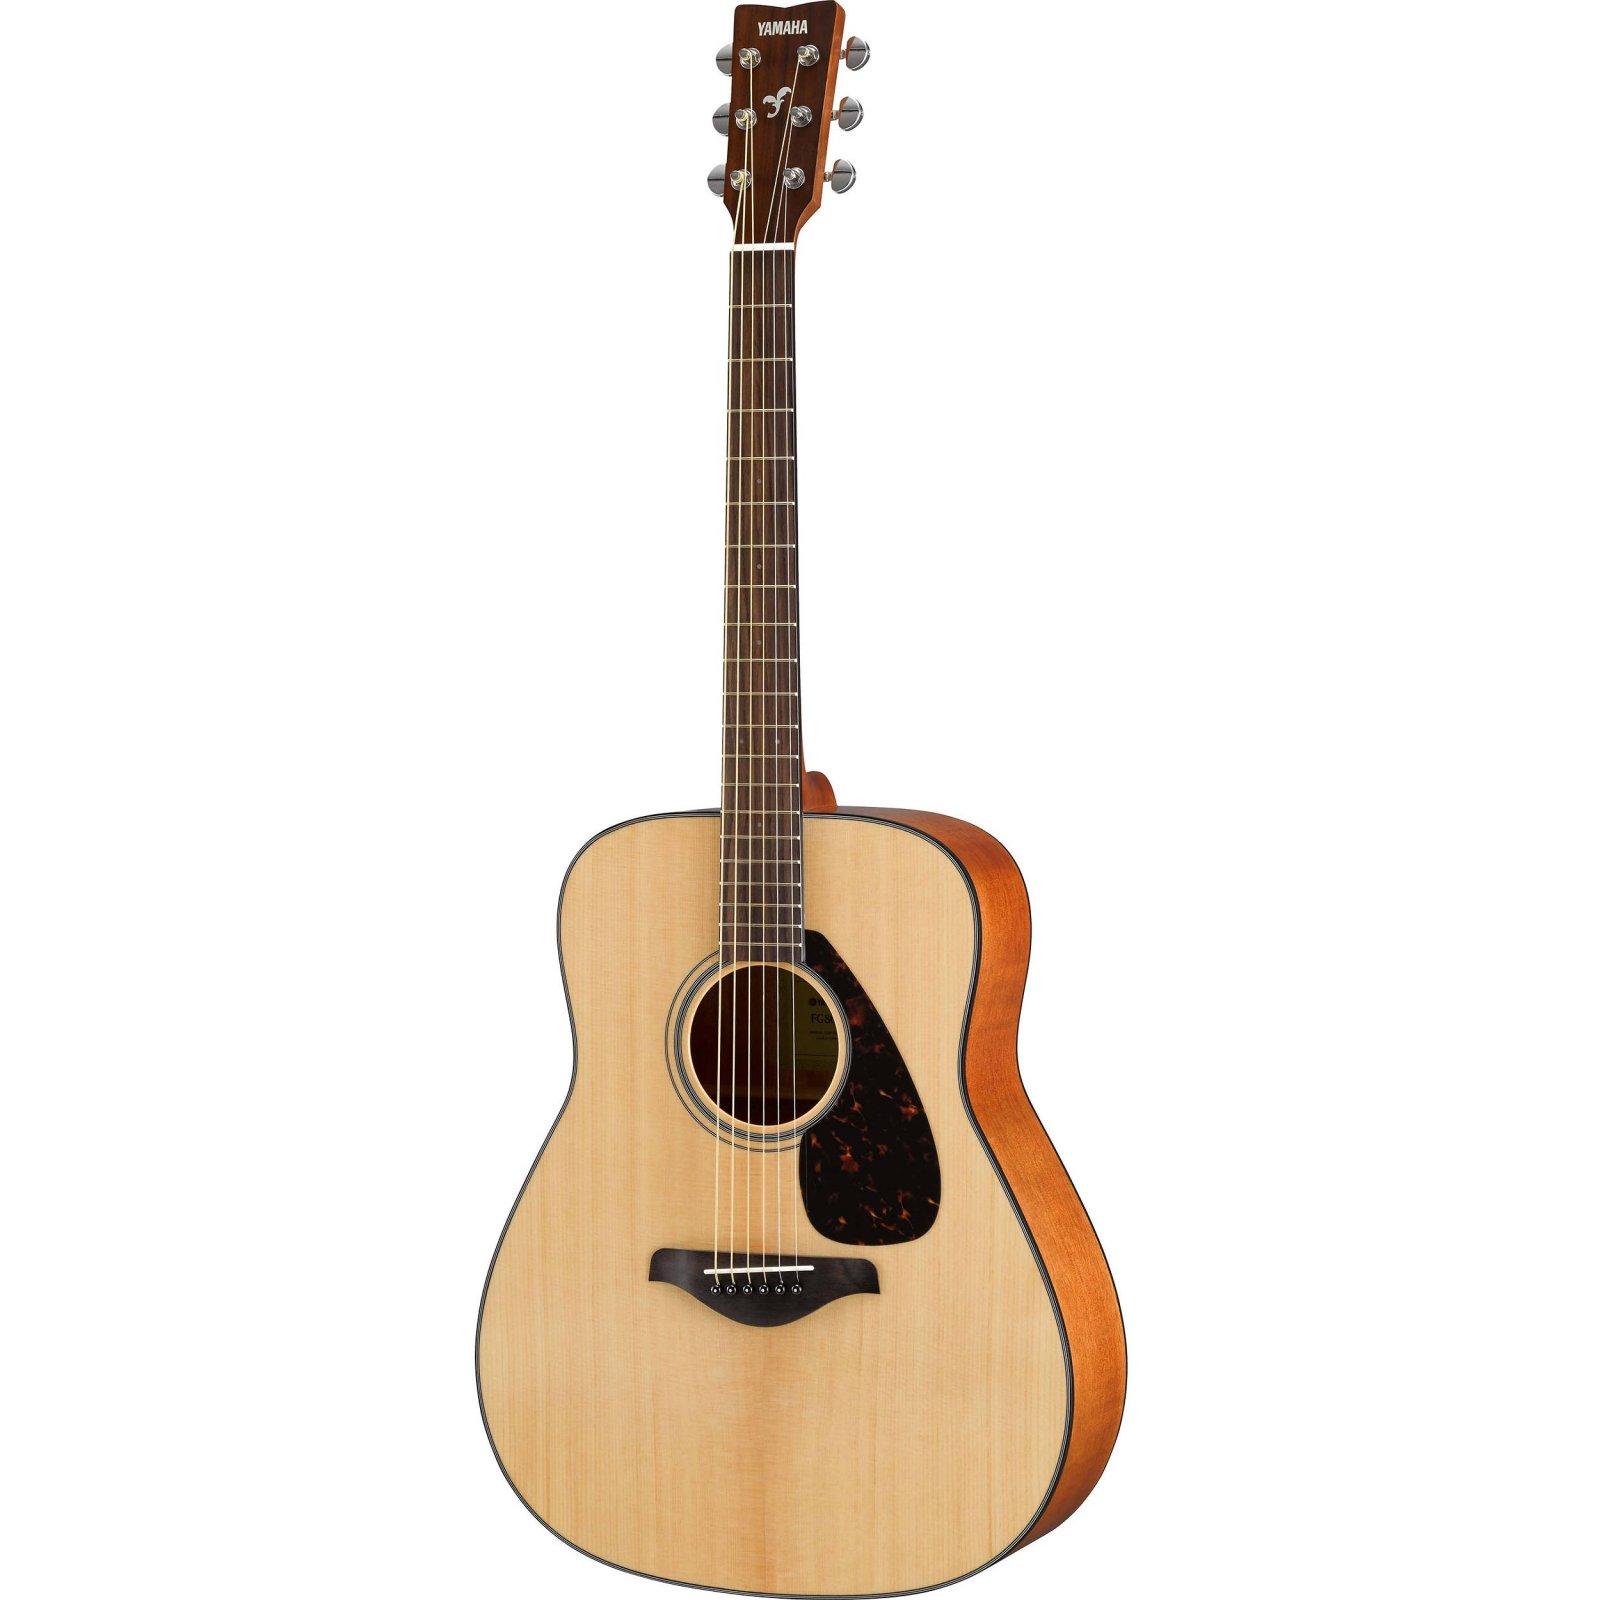 Yamaha FG800 Folk Guitar-Solid Spruce Top, Nato BS